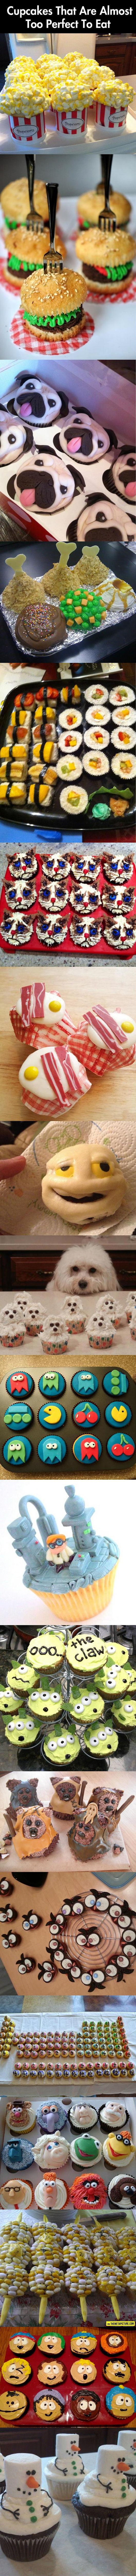 cool-cupcakes-popcorn-shape-perfect